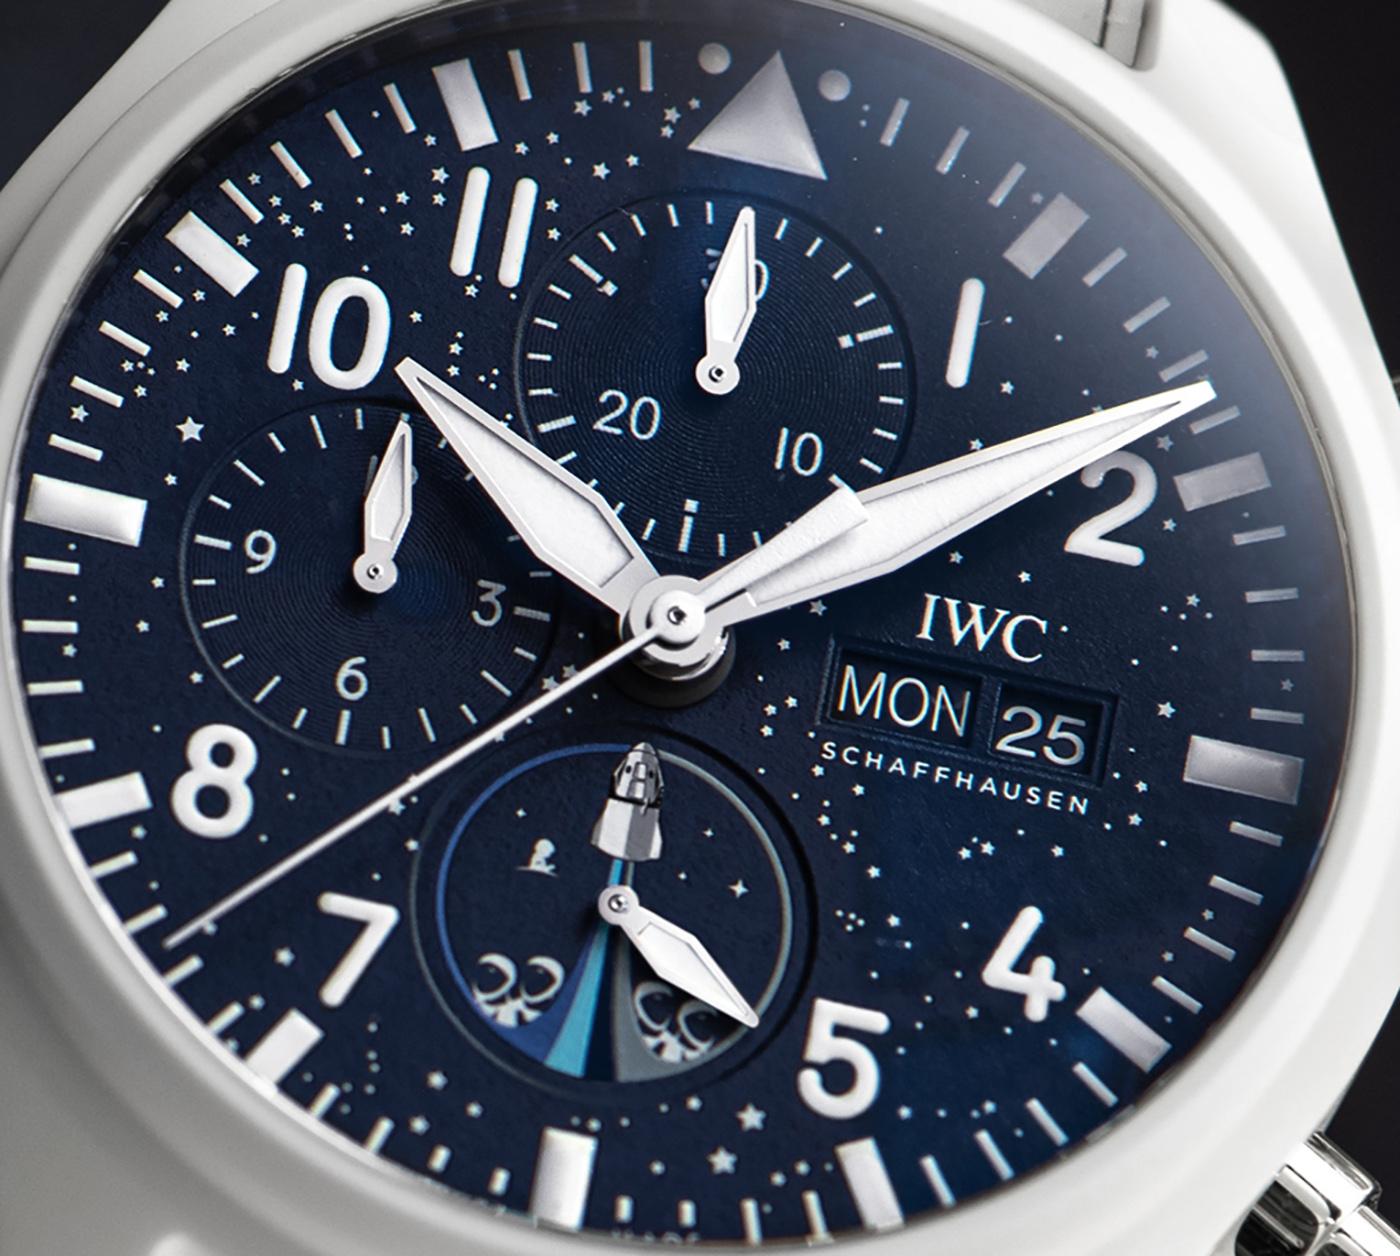 IWC Pilot's Watch Chronograph Inspiration4 Edition IW389110 Detalle esfera